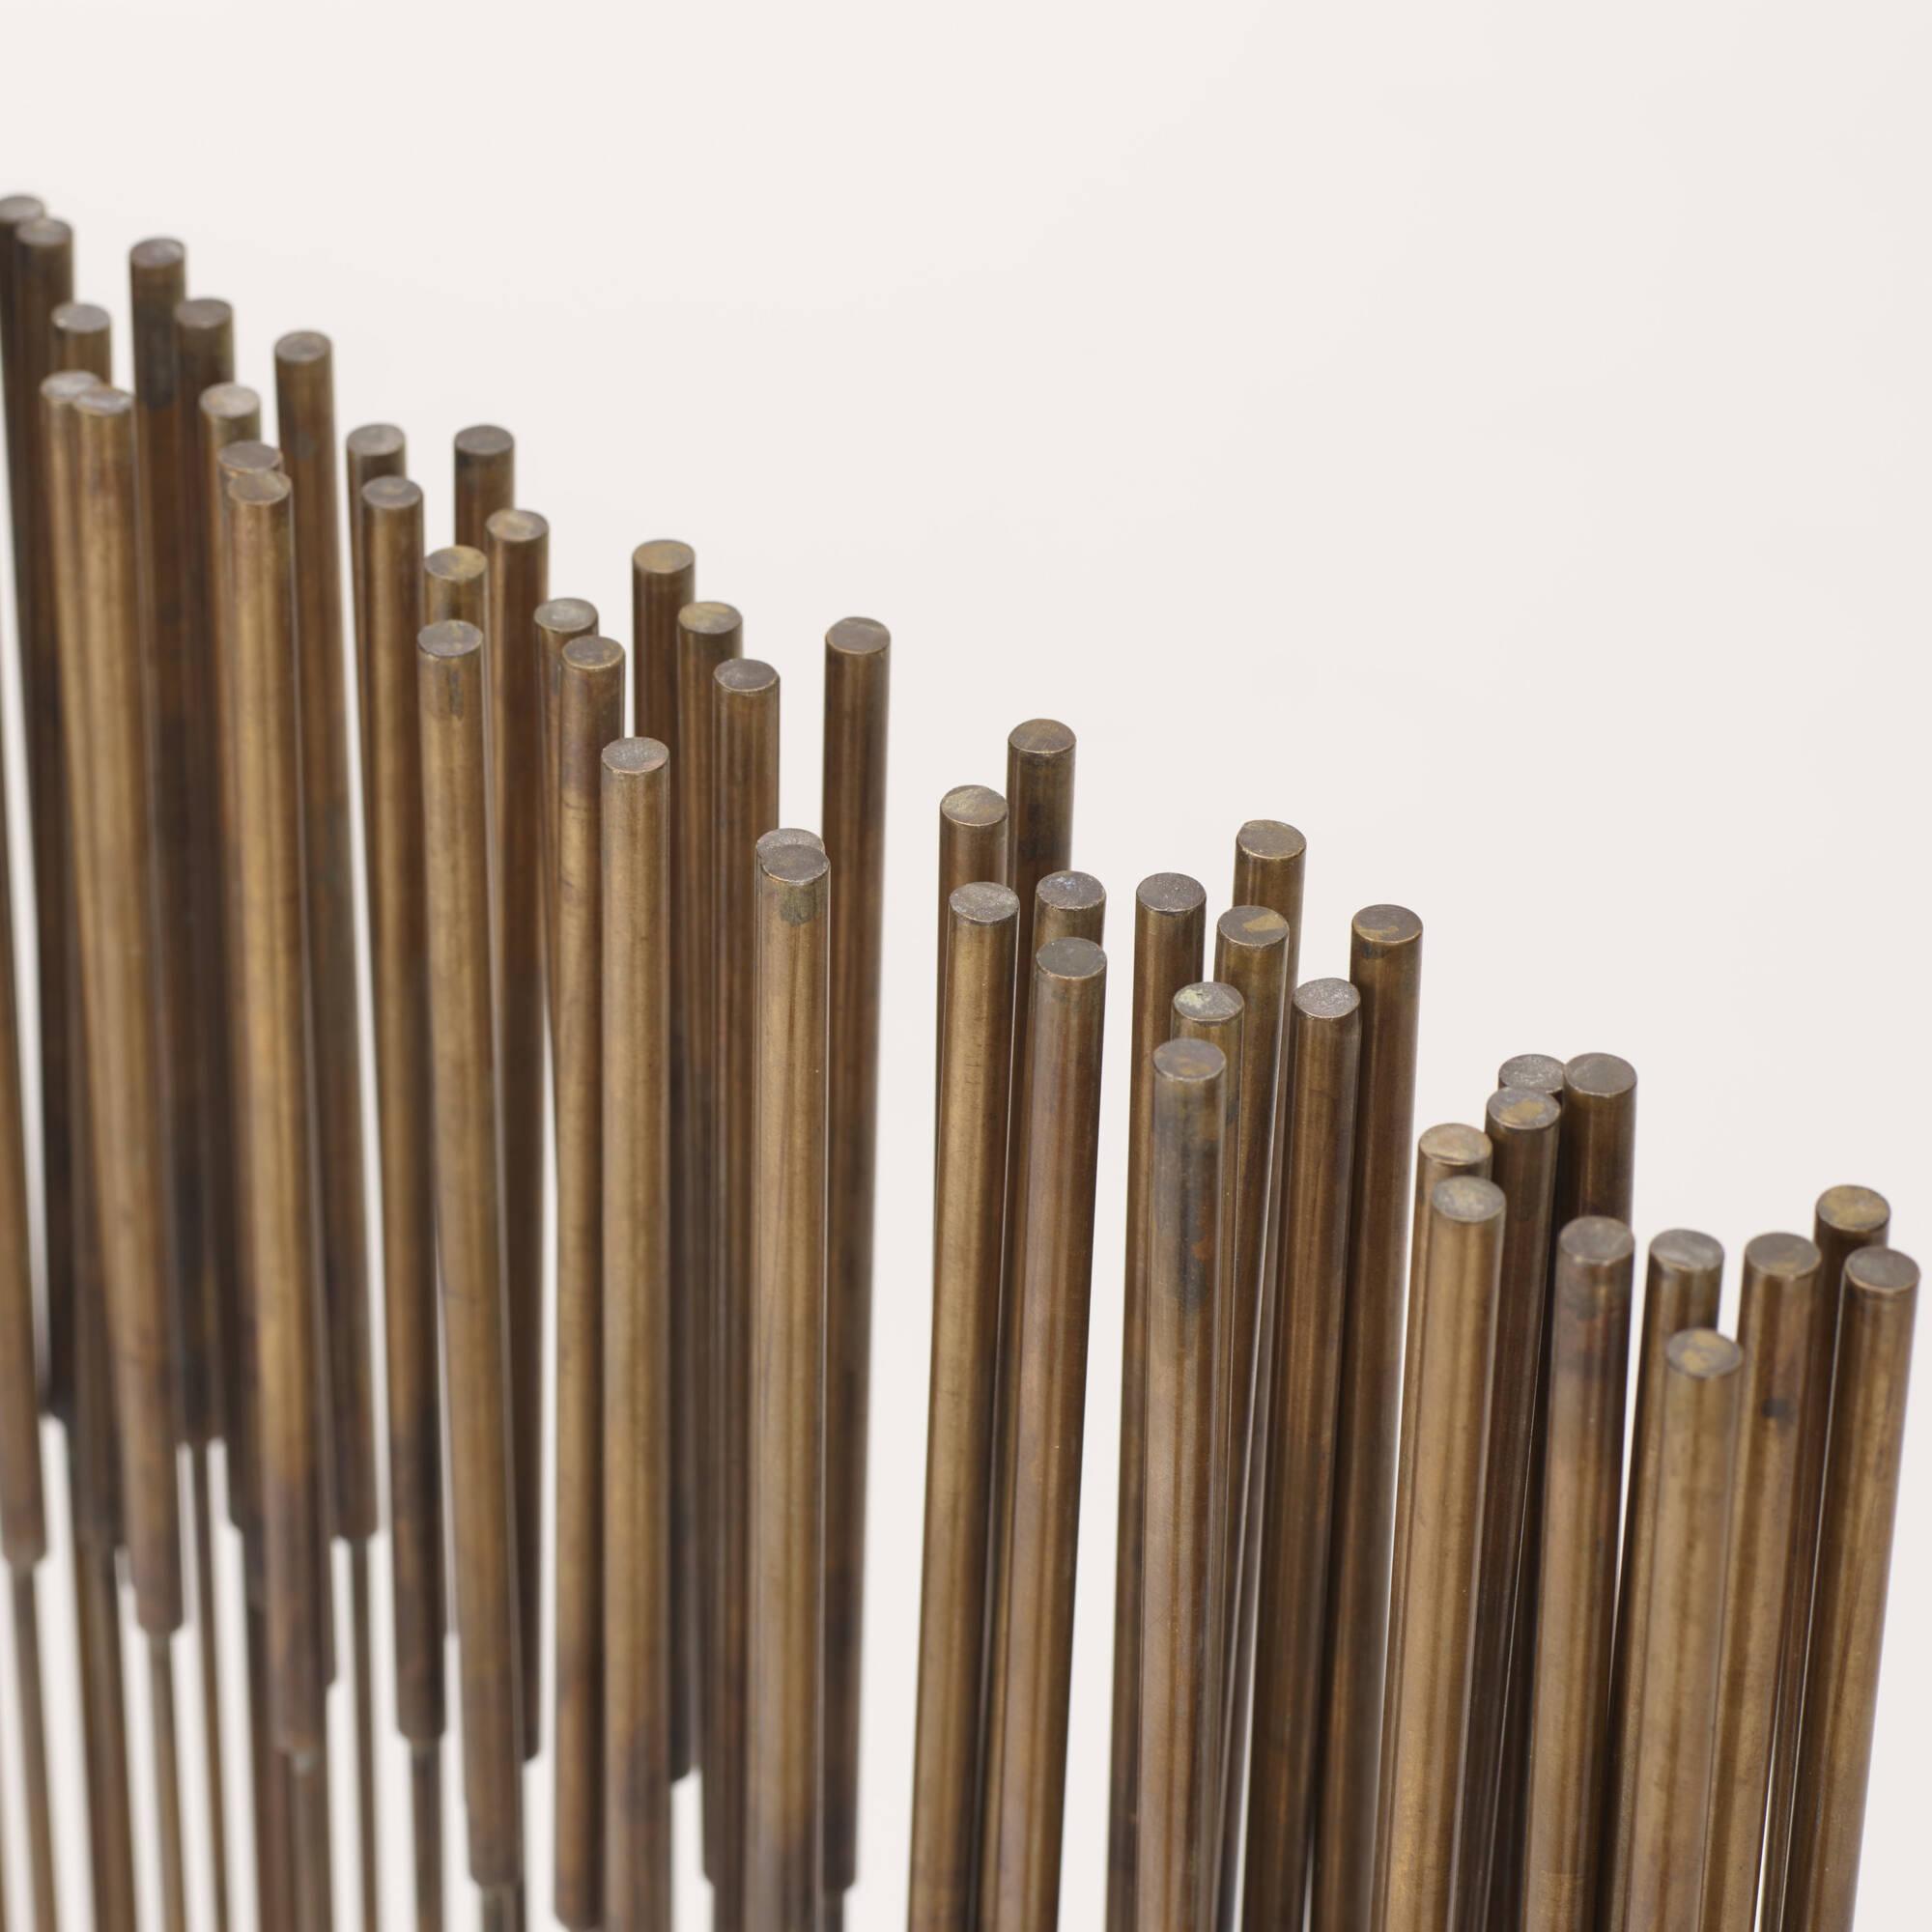 187: Harry Bertoia / Untitled (Sonambient) (2 of 3)